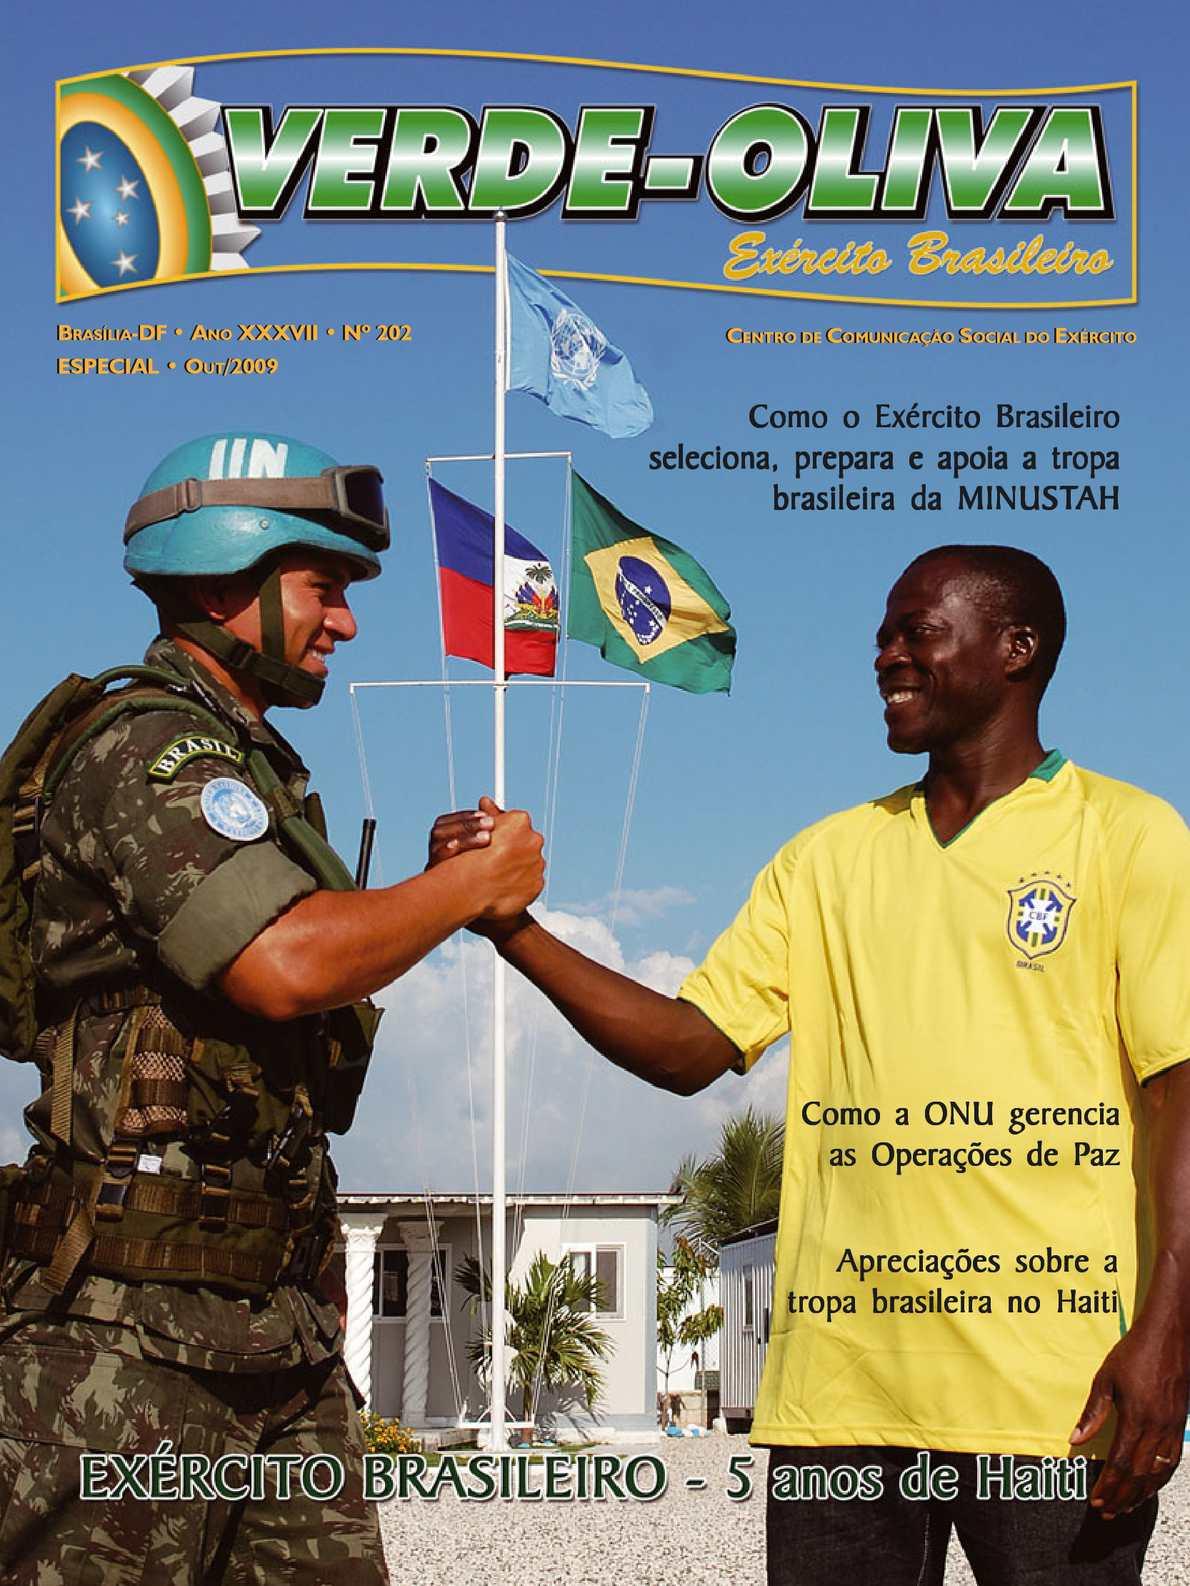 Calaméo - Revista Verde-Oliva nº 202 bdc9832df0c